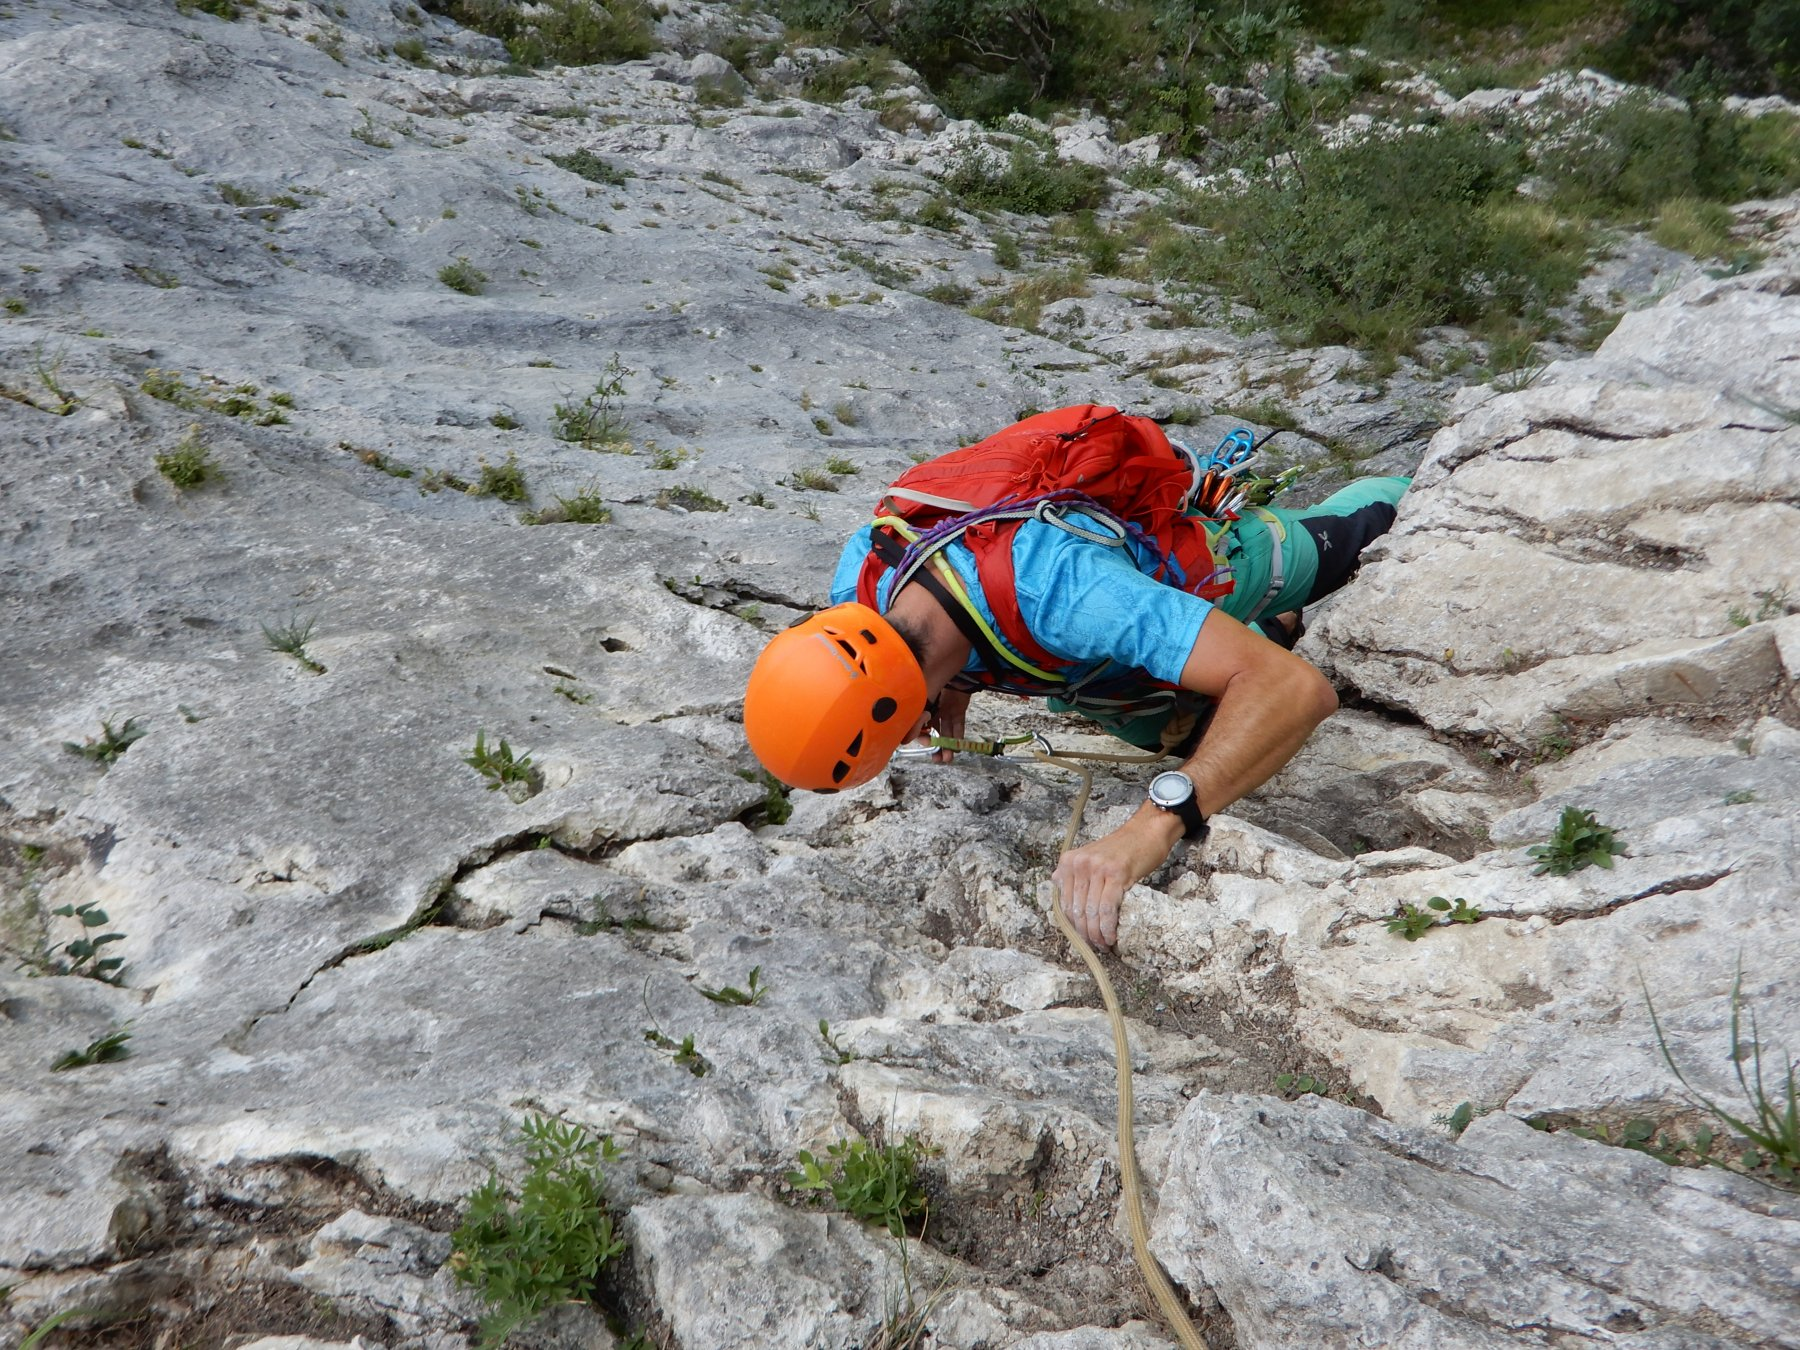 Procinto (Monte) Diedro delle Sorprese 2019-08-18